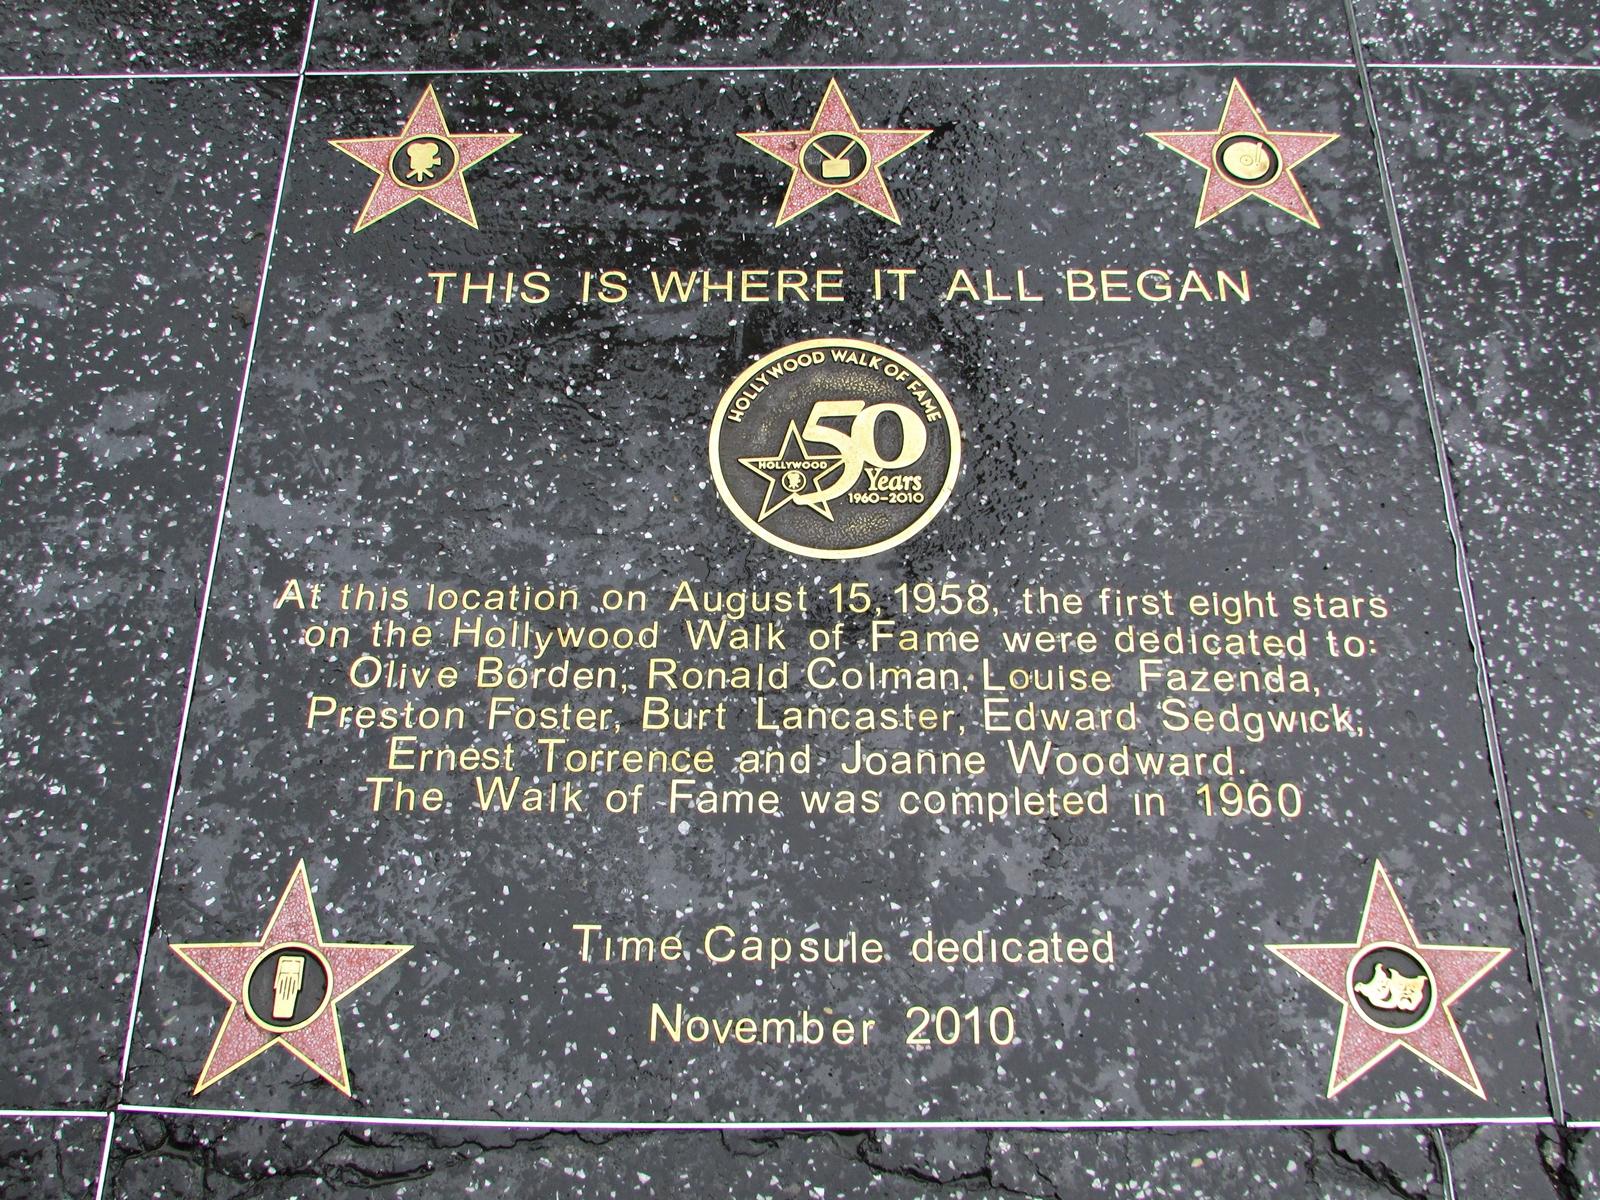 Hollywood Walk of Fame - Stars - USA Roadtrip - Amerika Rundreise - Fashionladyloves by Tamara Wagner - Travelblog